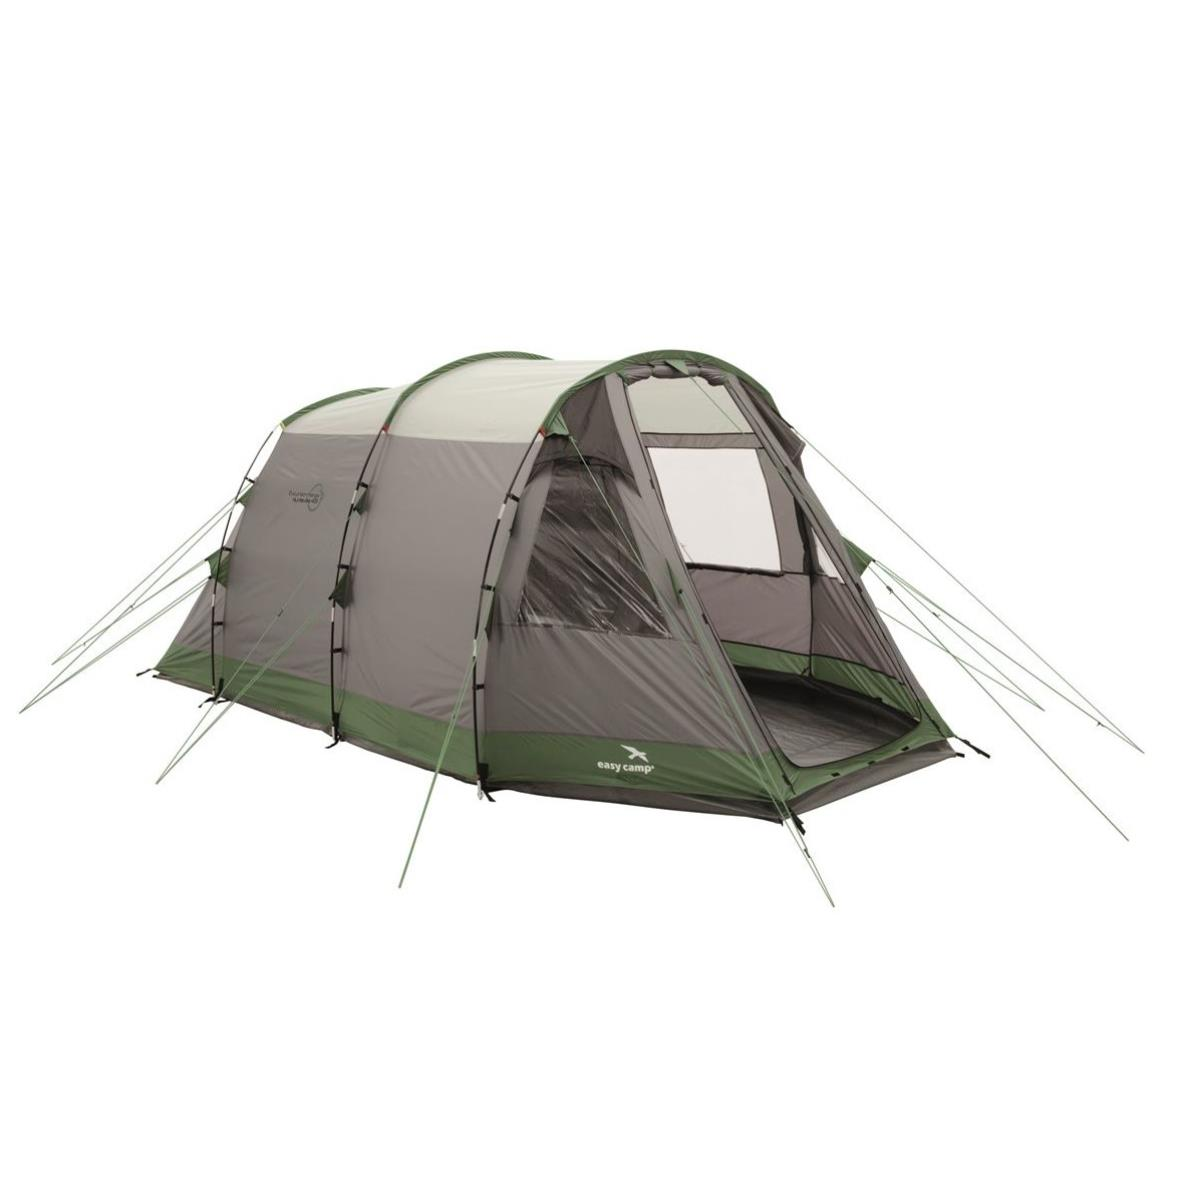 easy camp Huntsville 400 Familienzelt grau,grey | 05709388086419